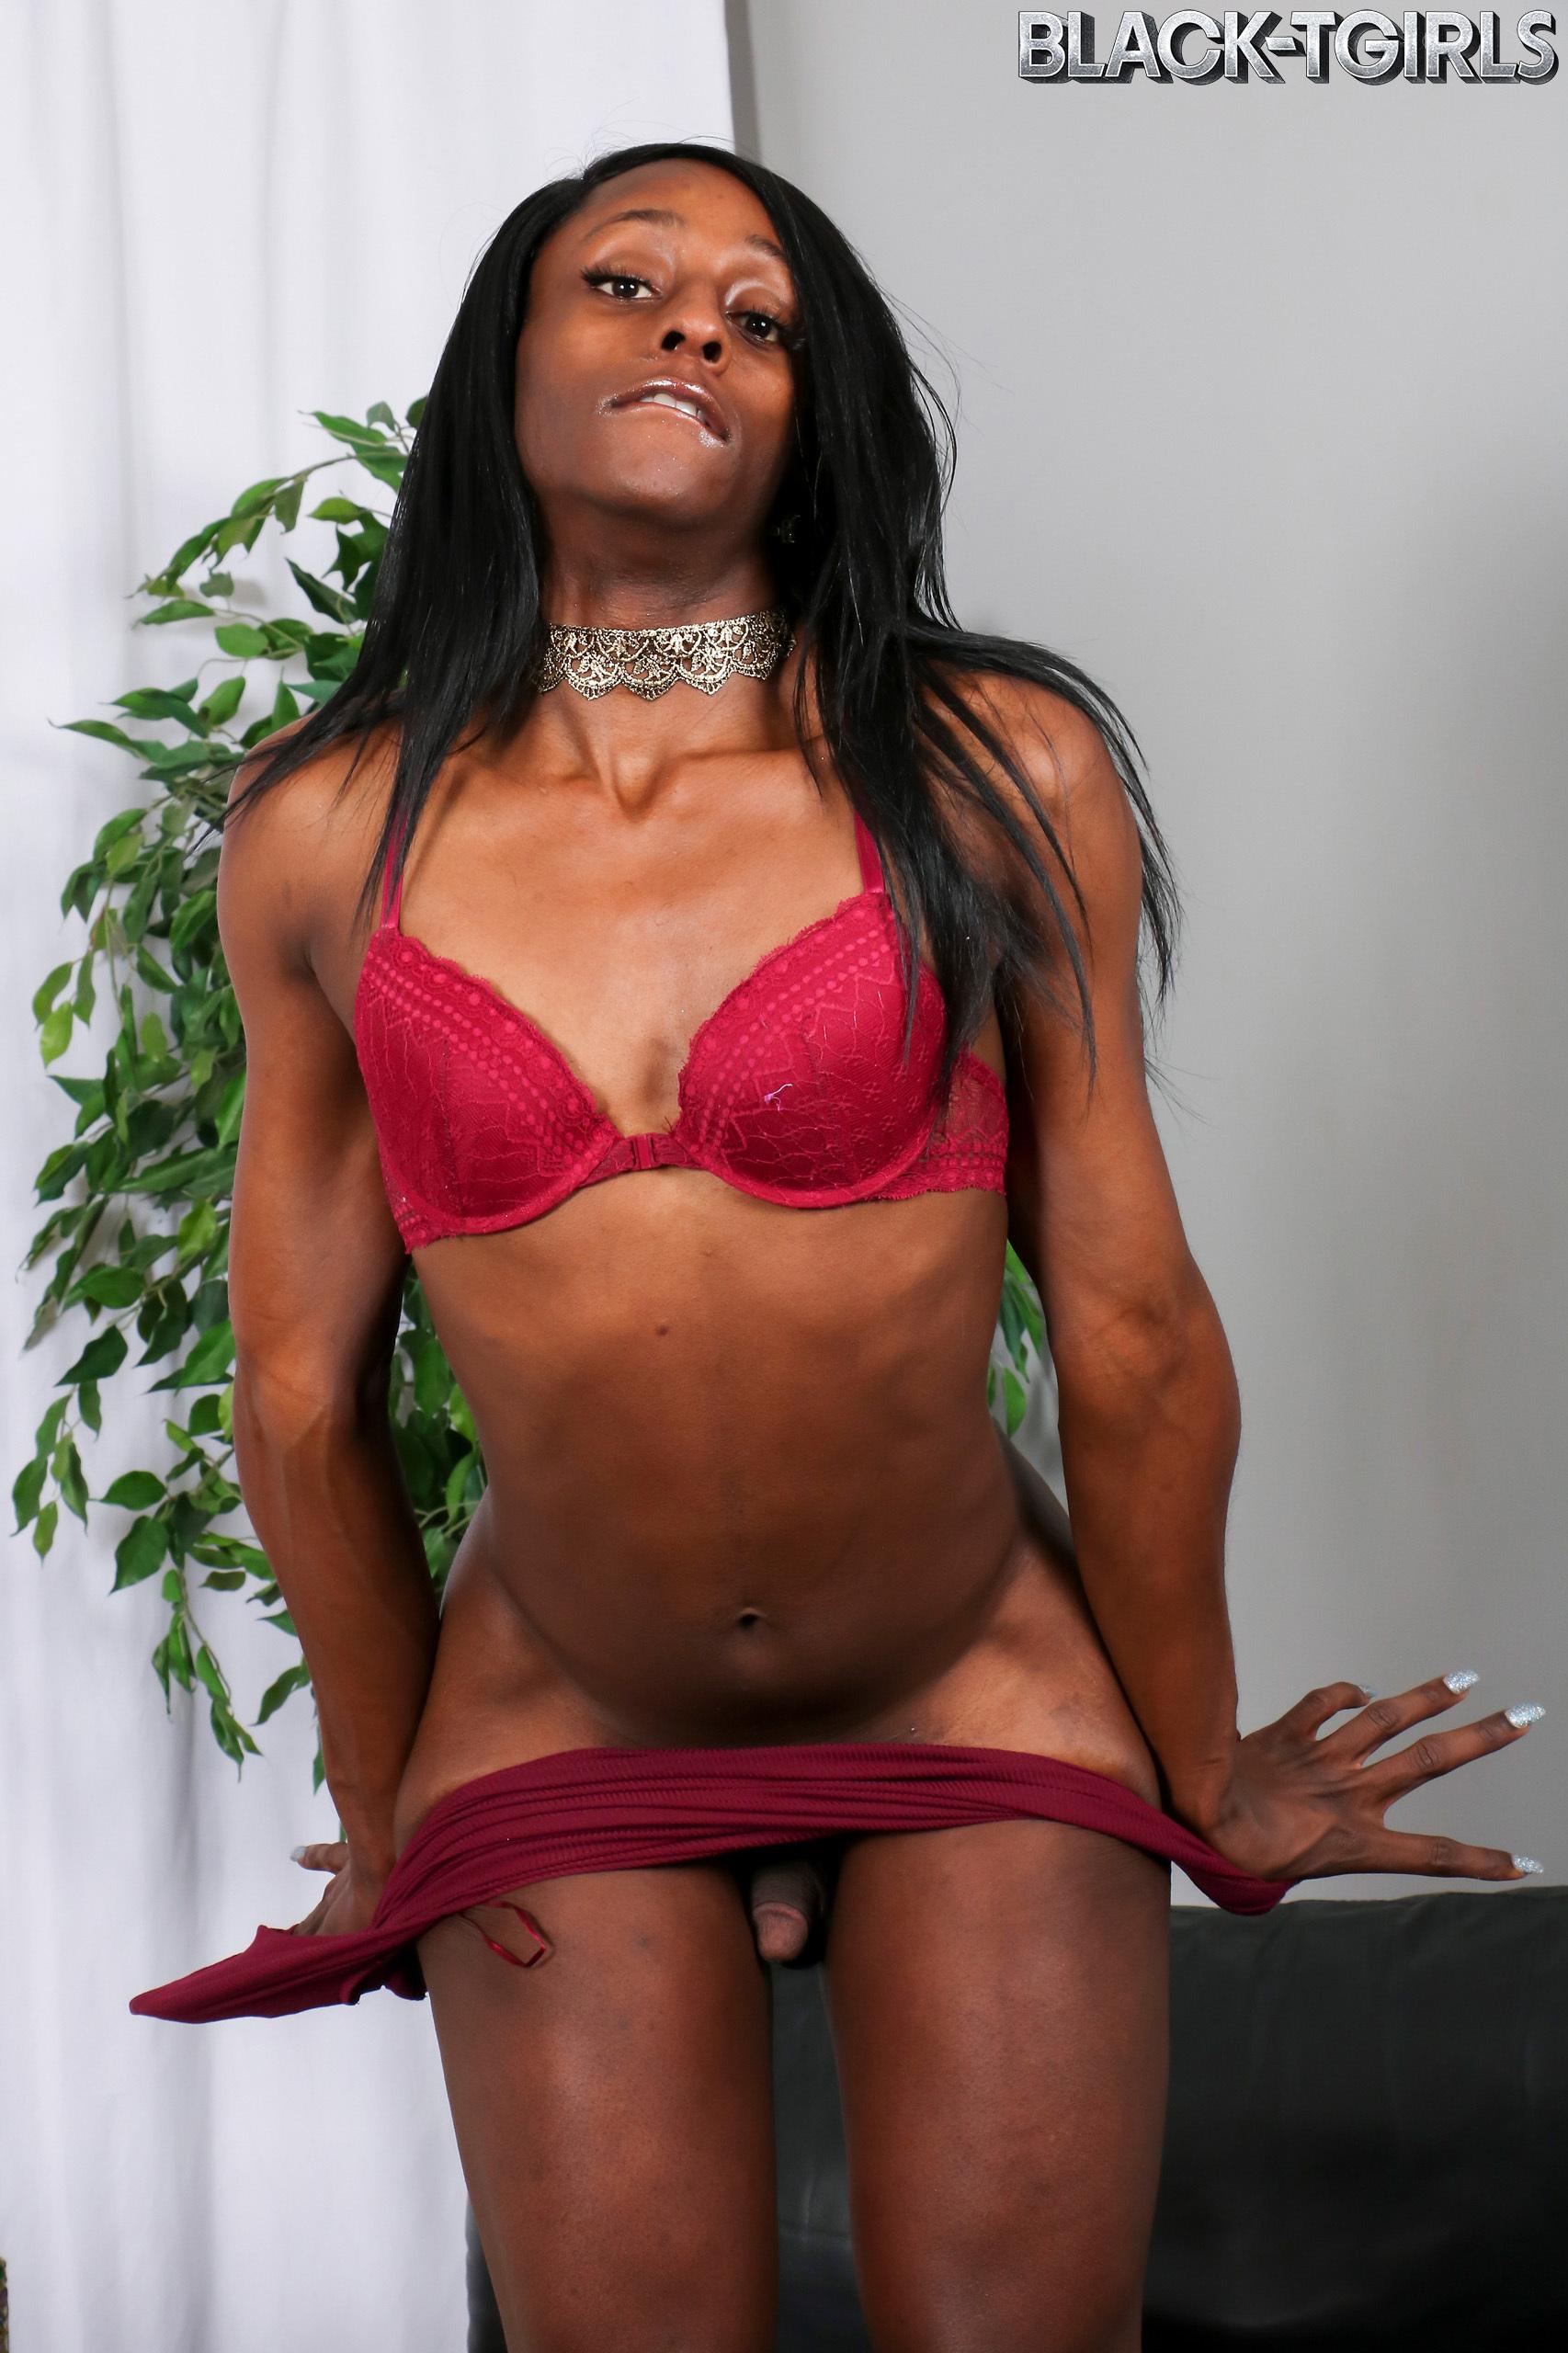 mexican brunette girls hottest pics